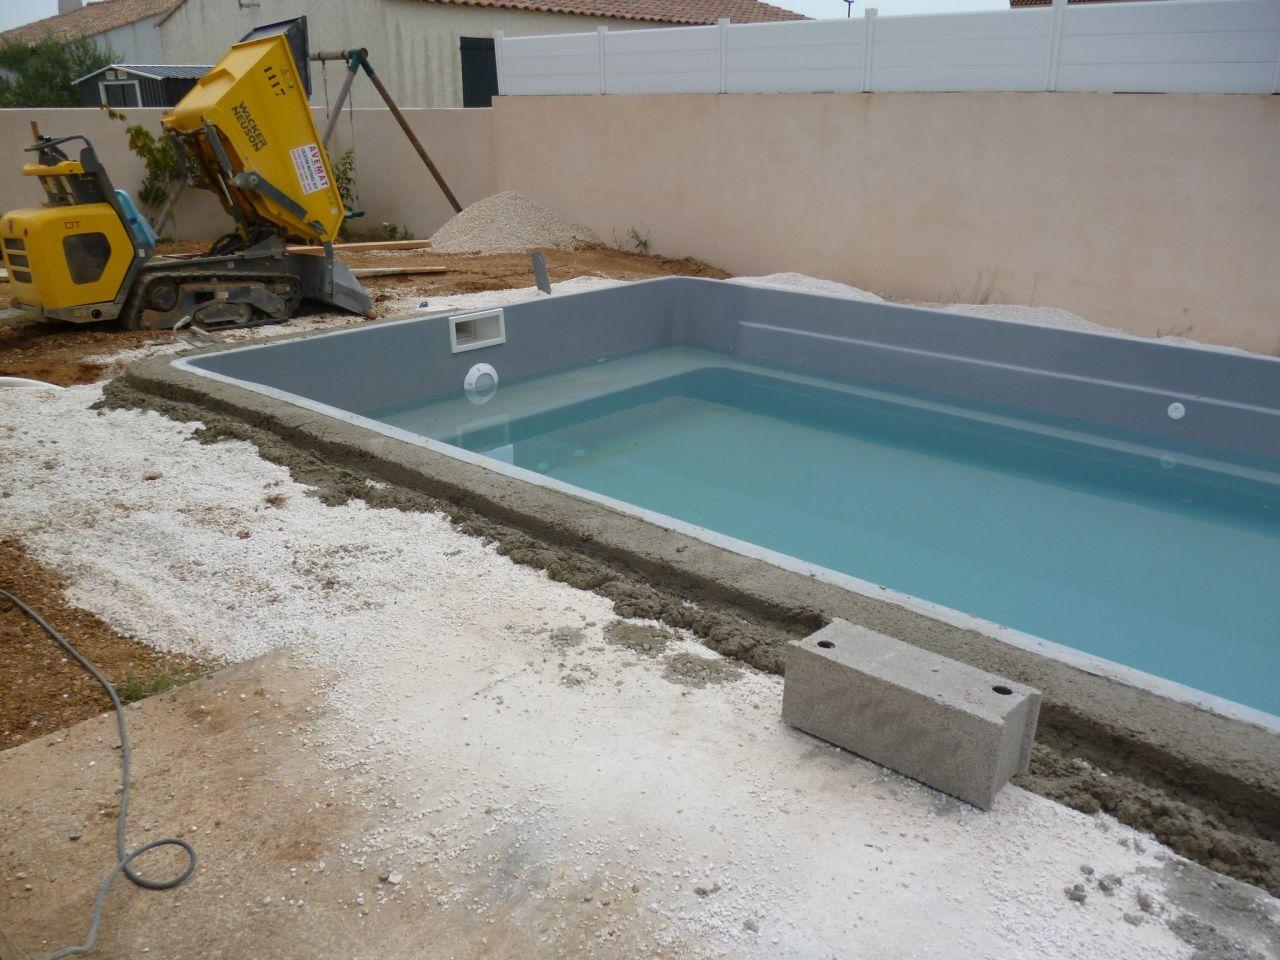 Photo ceinture b ton construction pose de la piscine for Ceinture beton piscine coque